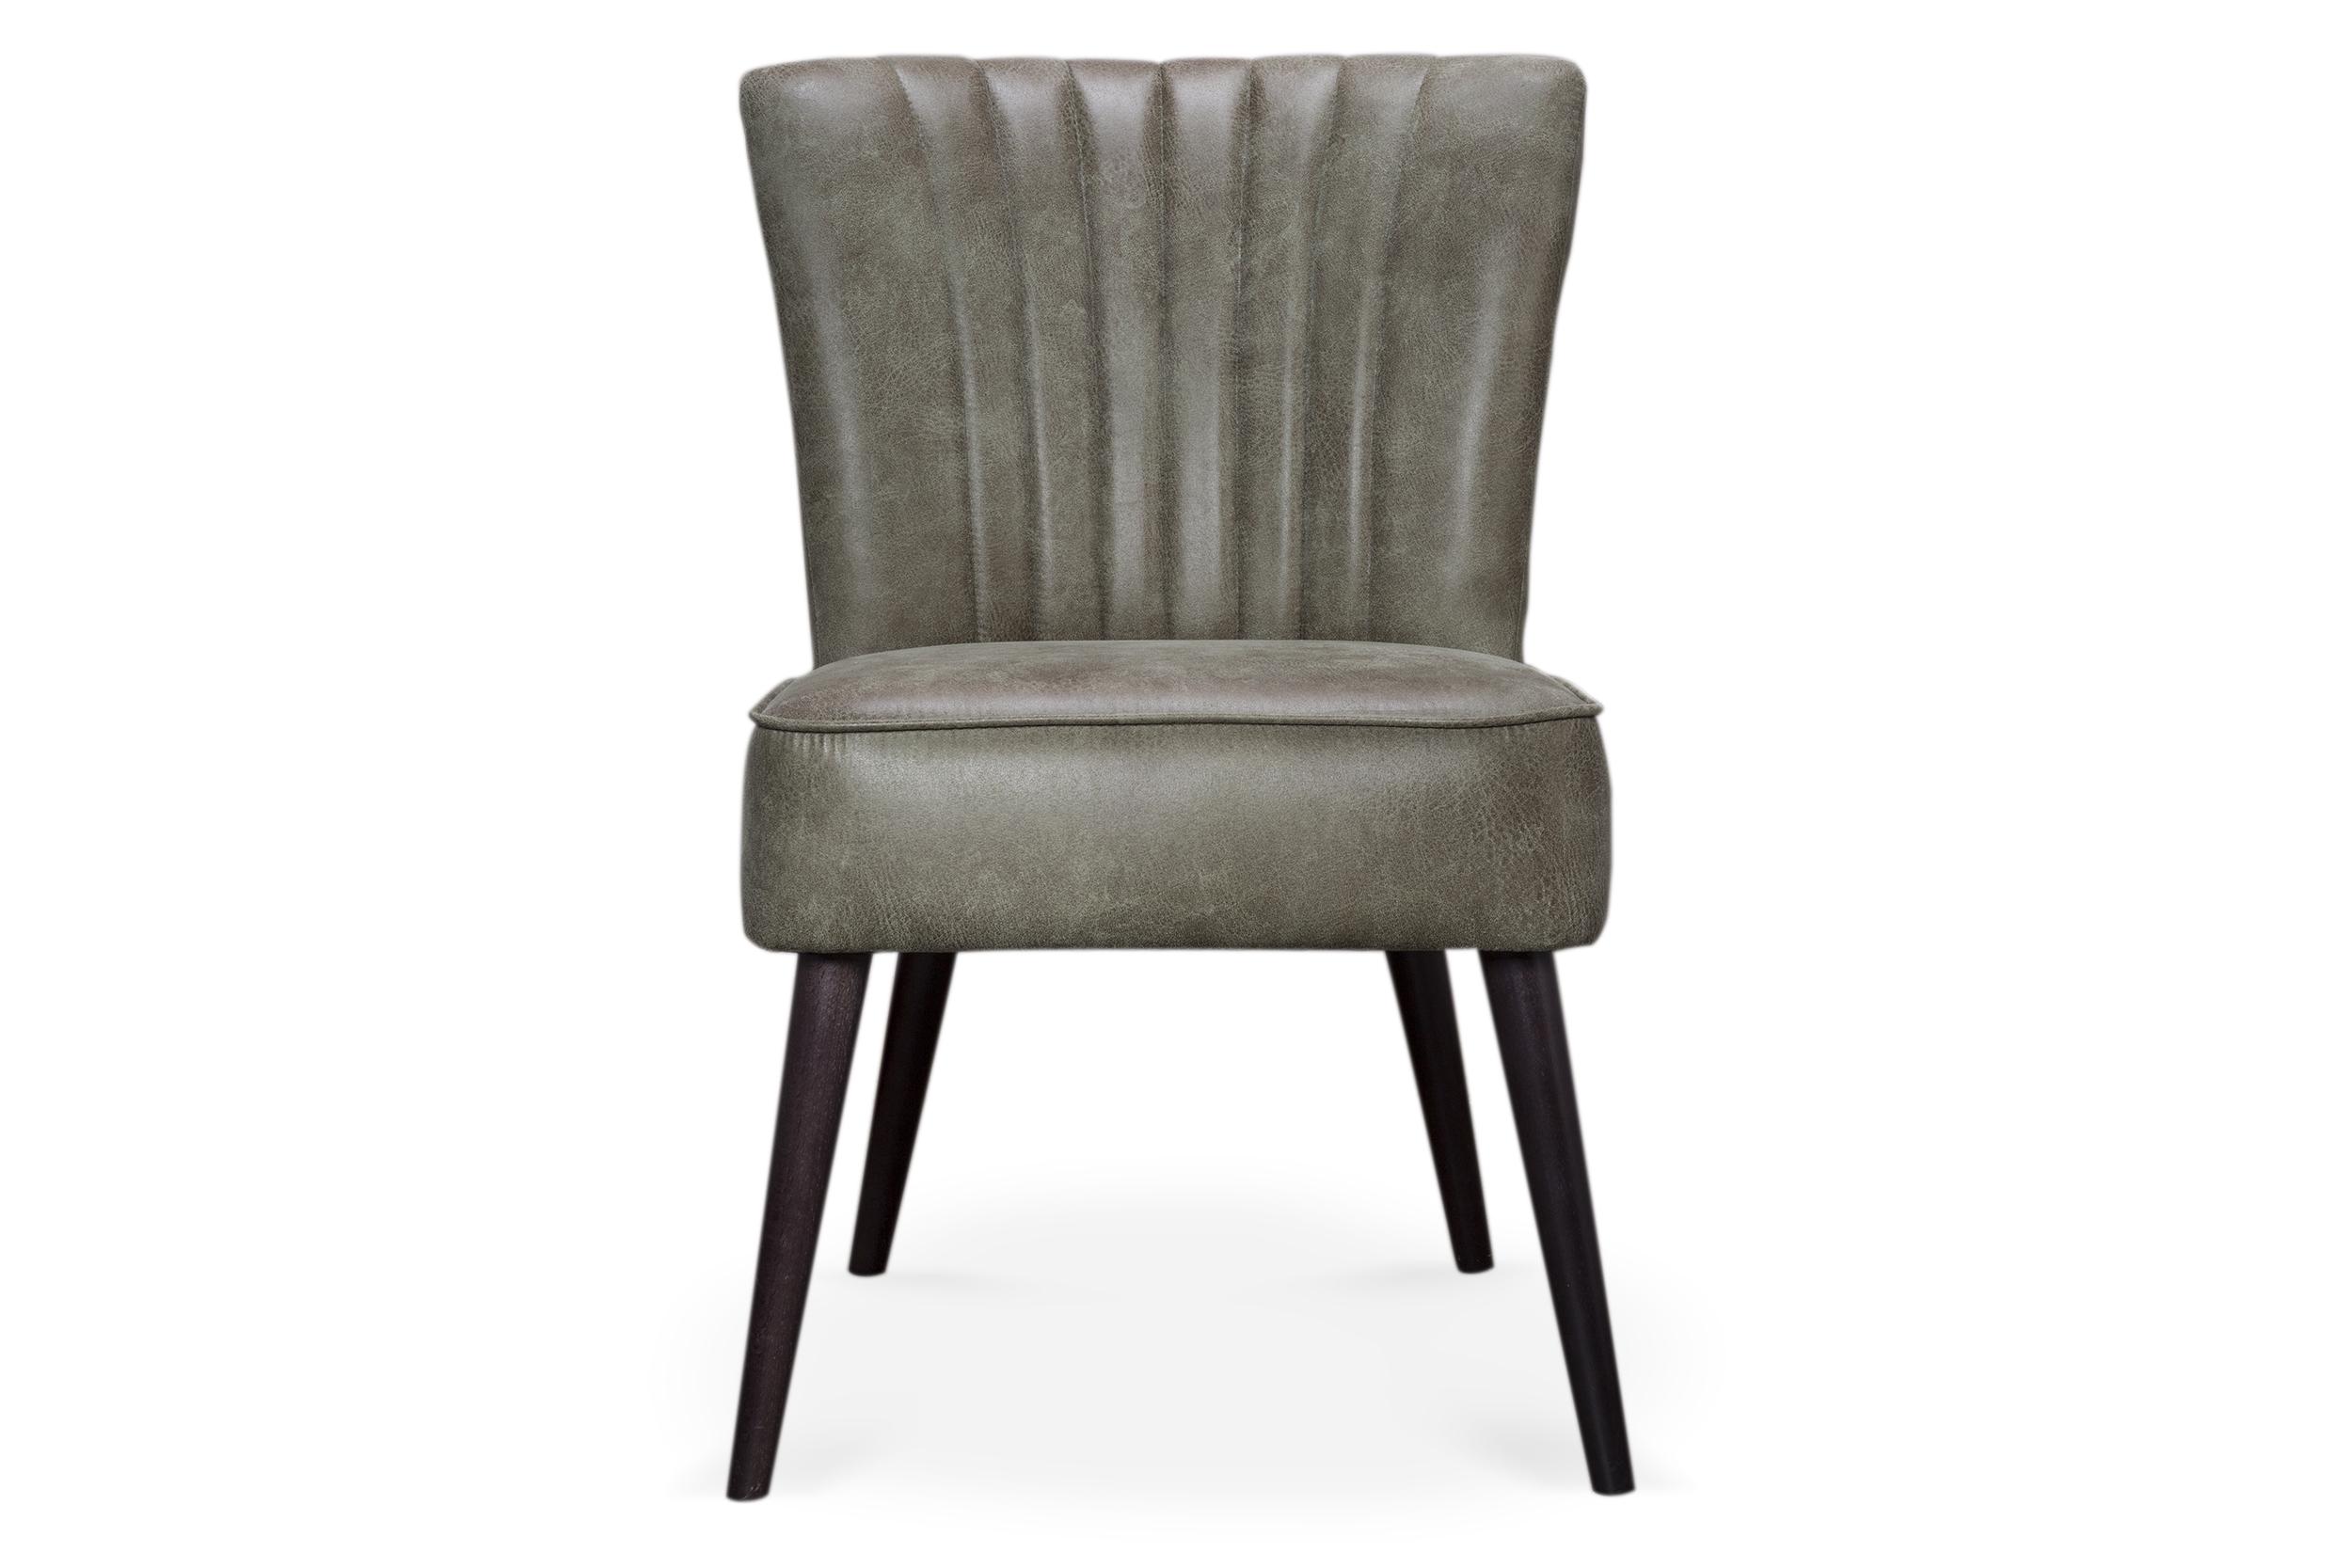 Кухонный стул MyFurnish 15433461 от thefurnish